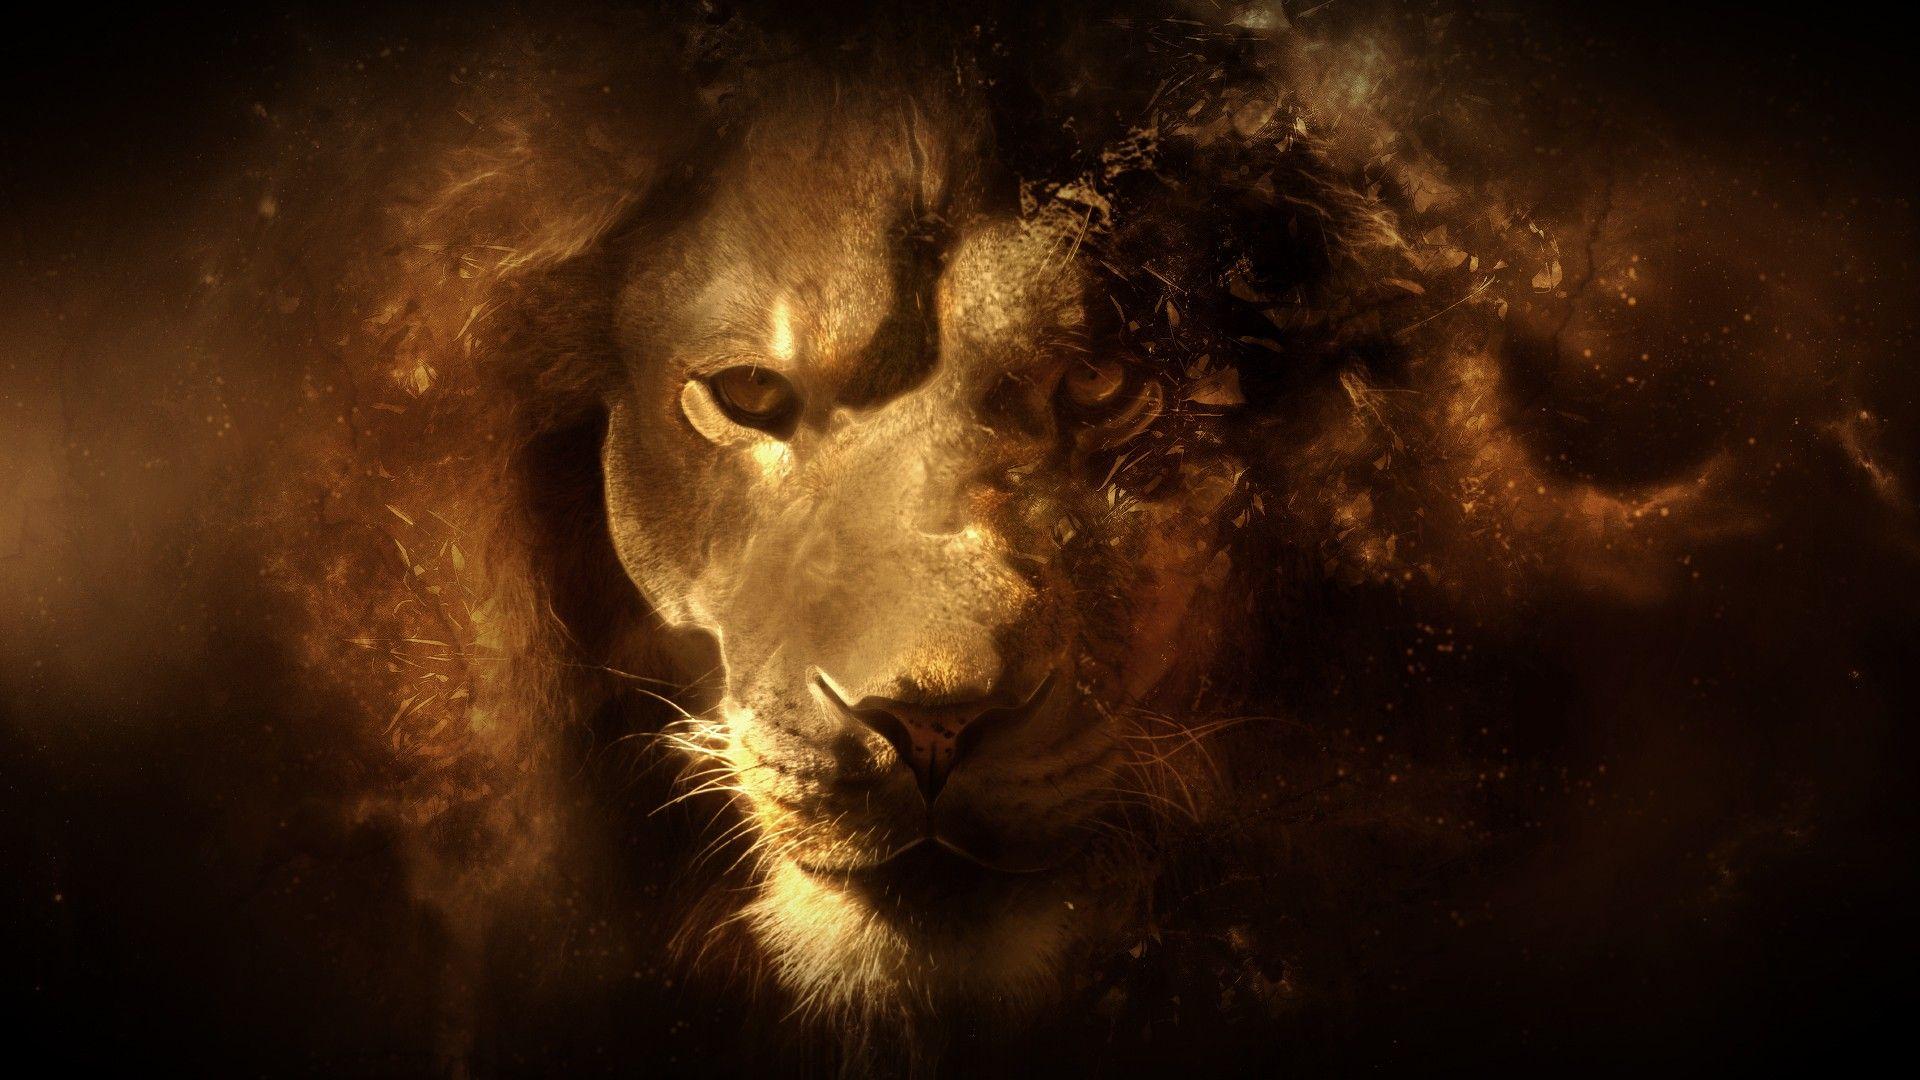 Lion Art Image